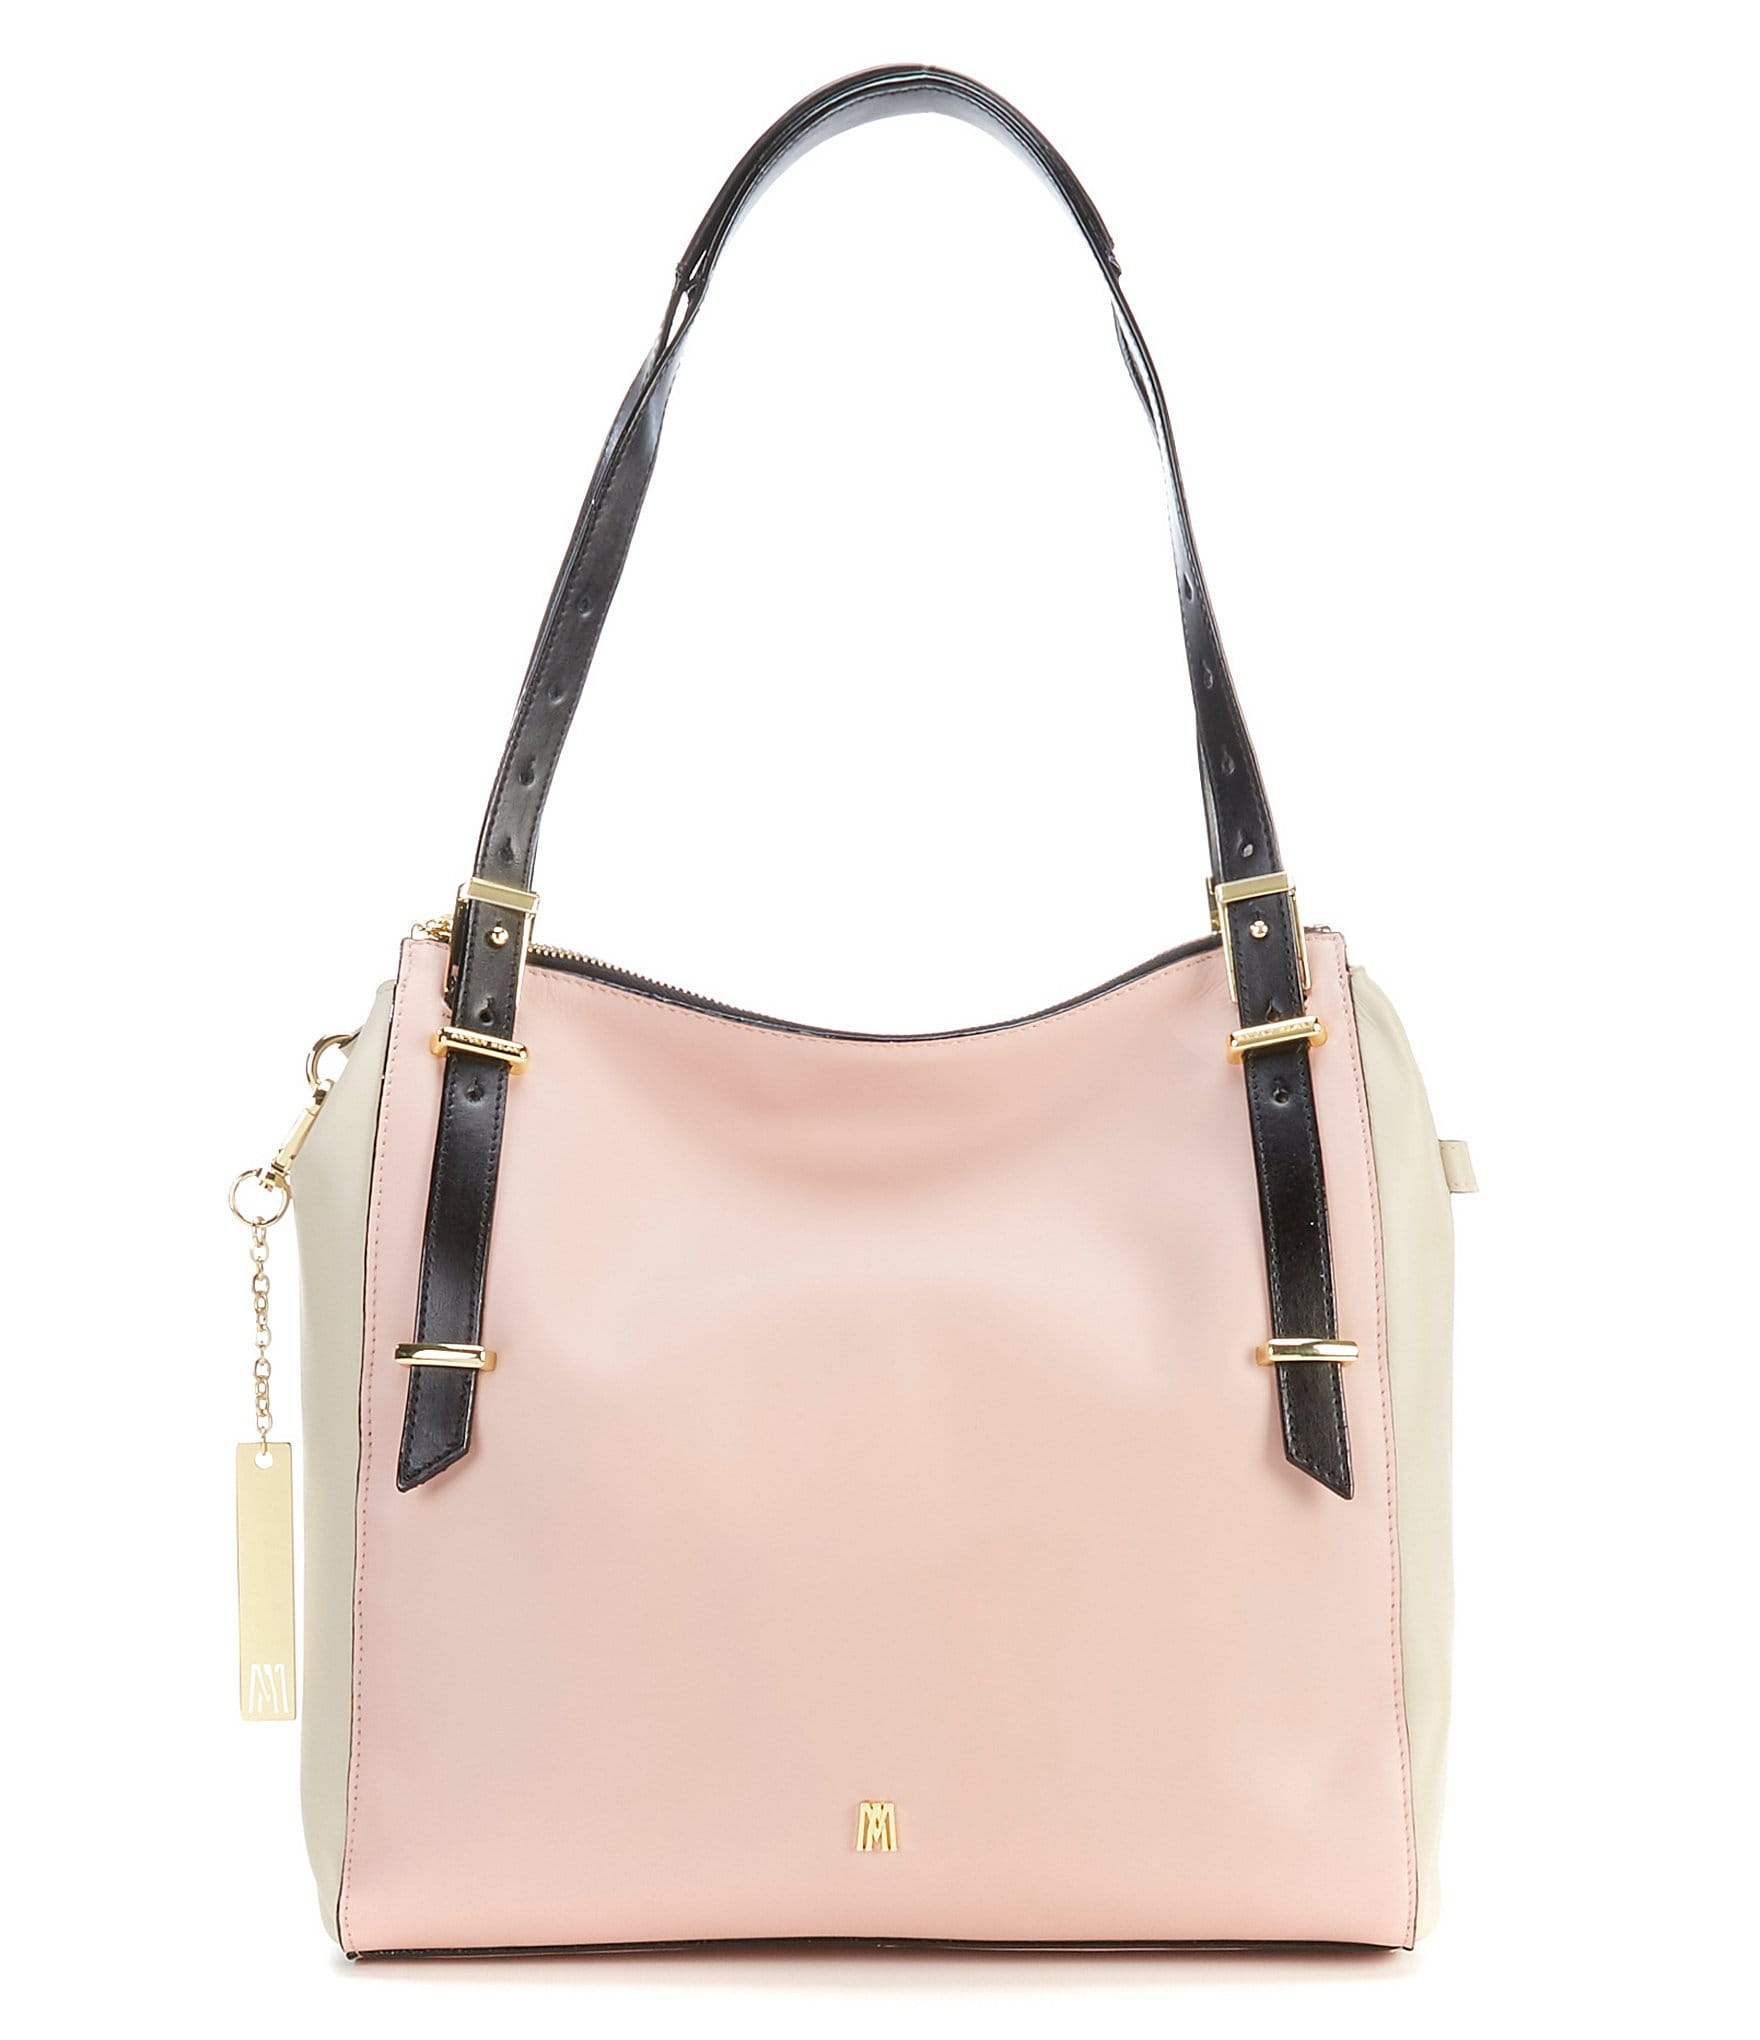 05ddeee81e5f Antonio Melani Colorblocked Hobo Bag